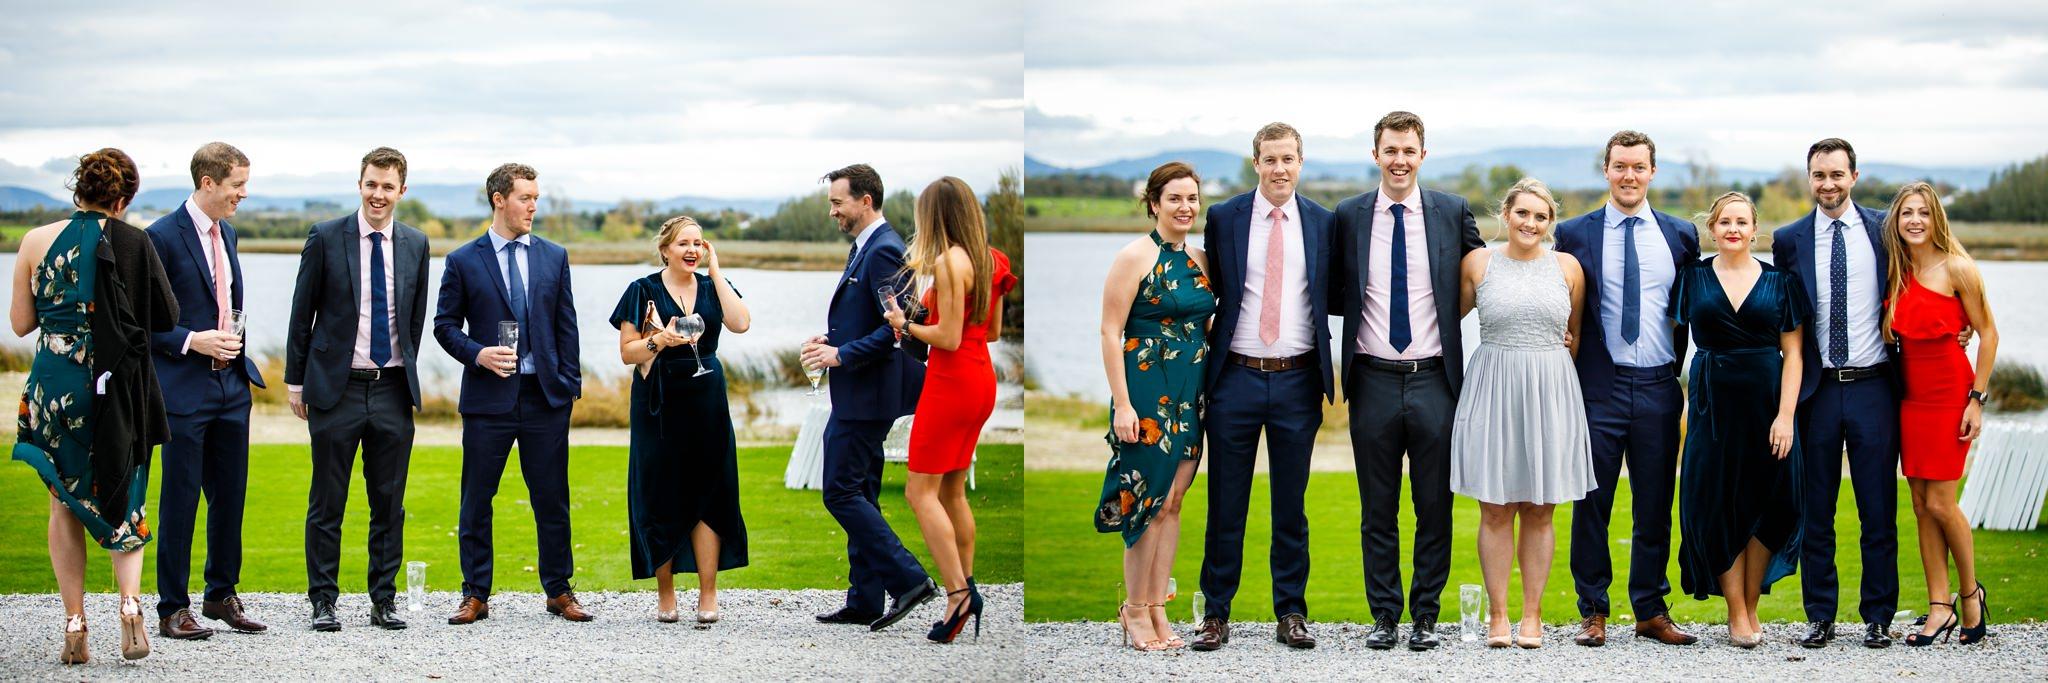 Elisha-Clarke-Photography-Dublin-City-Wedding_0097.jpg